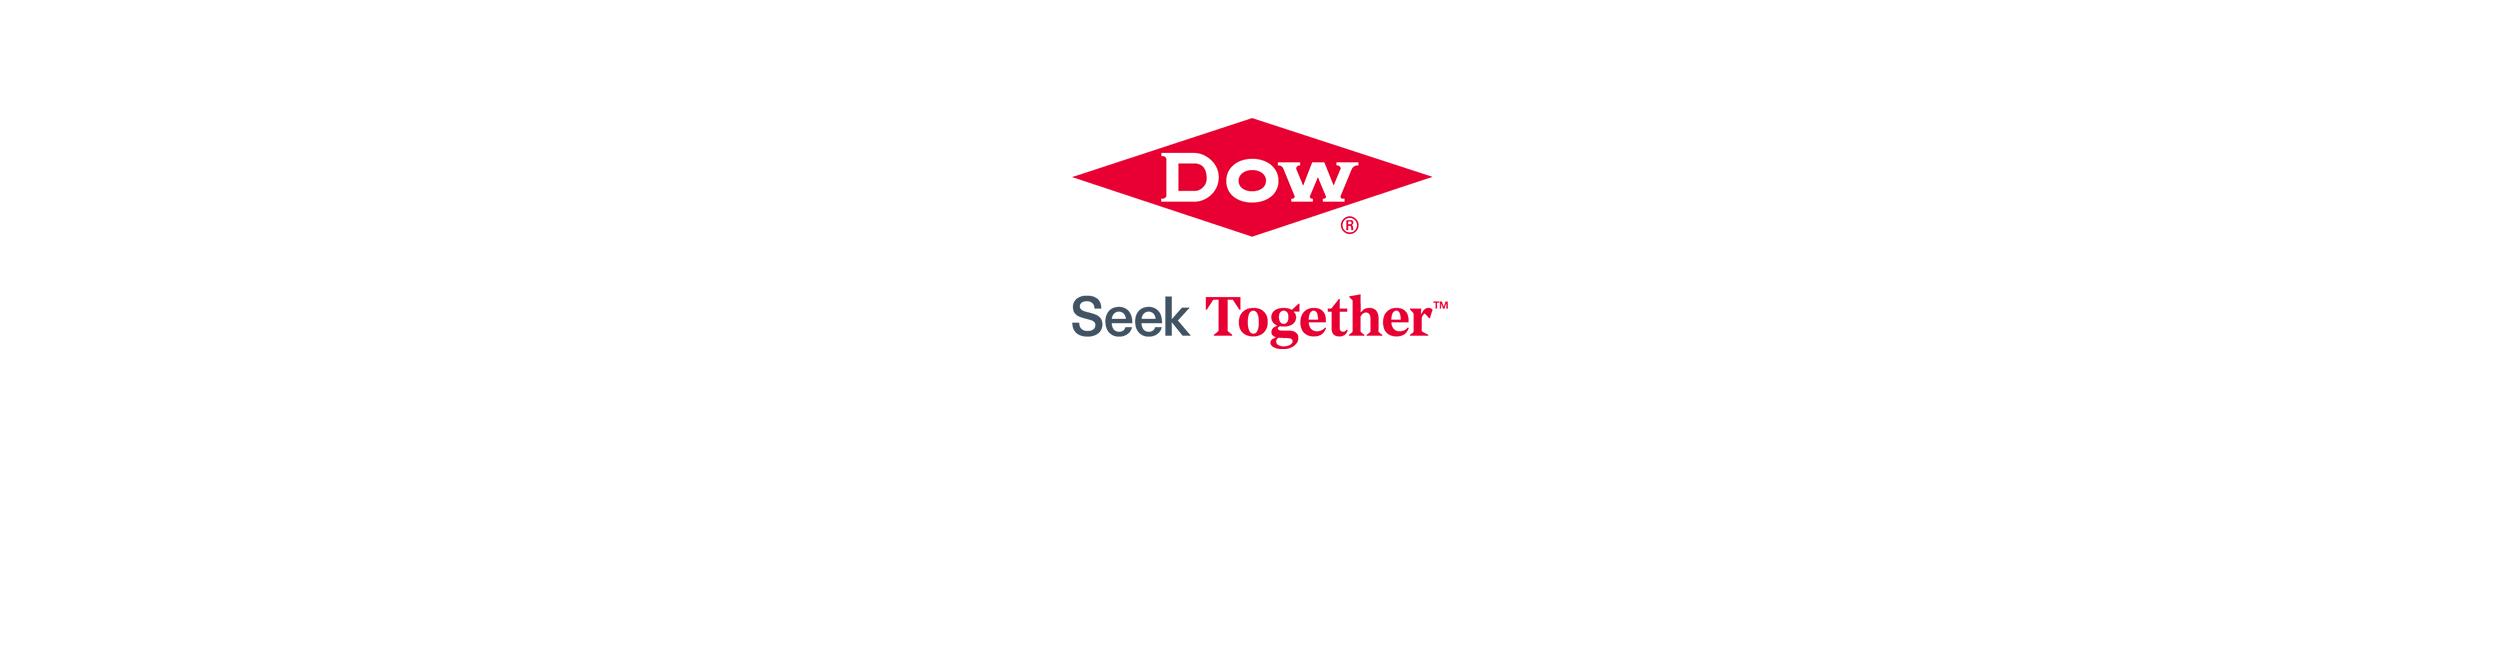 Dow_Header.jpg